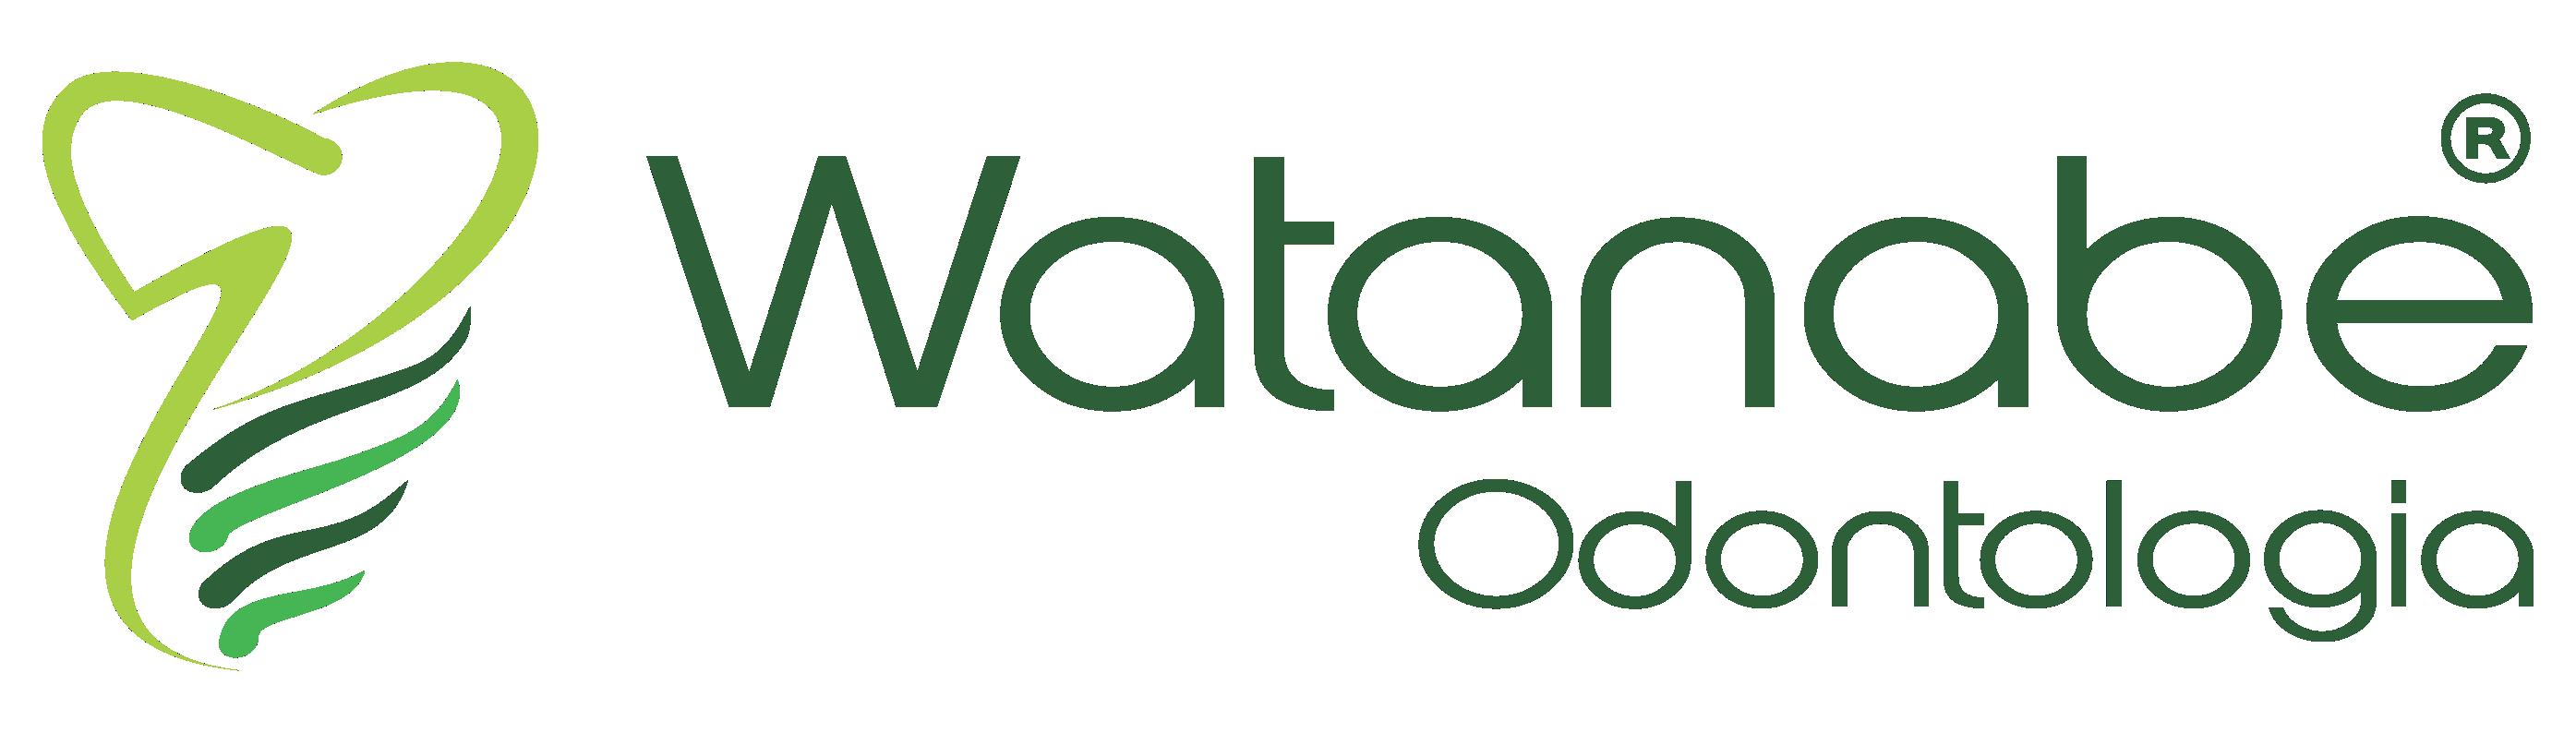 Watanabe Odontologia